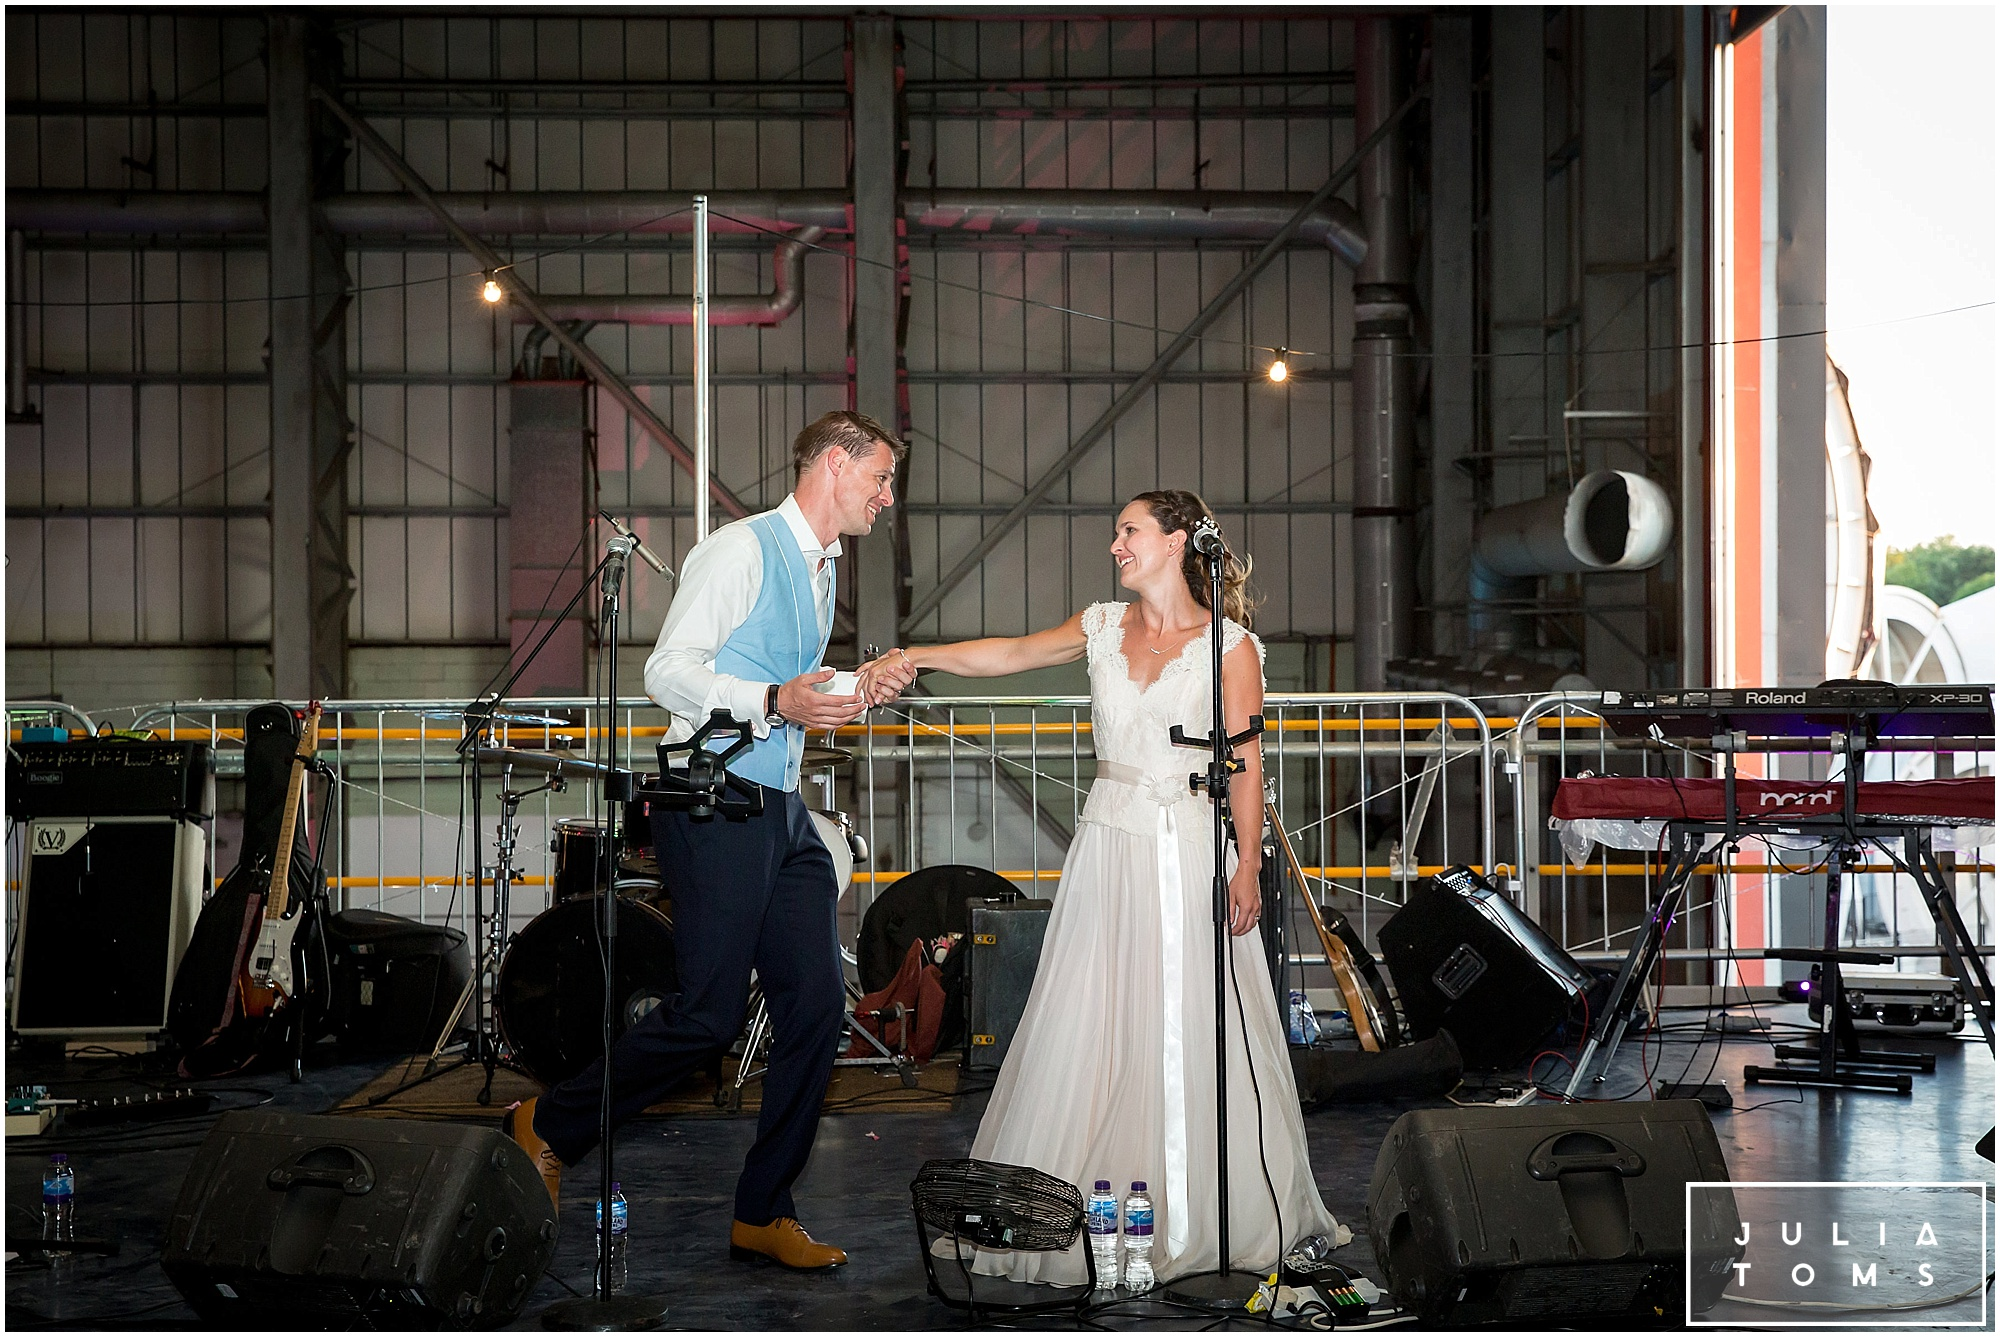 julia_toms_chichester_wedding_photographer_portsmouth_065.jpg